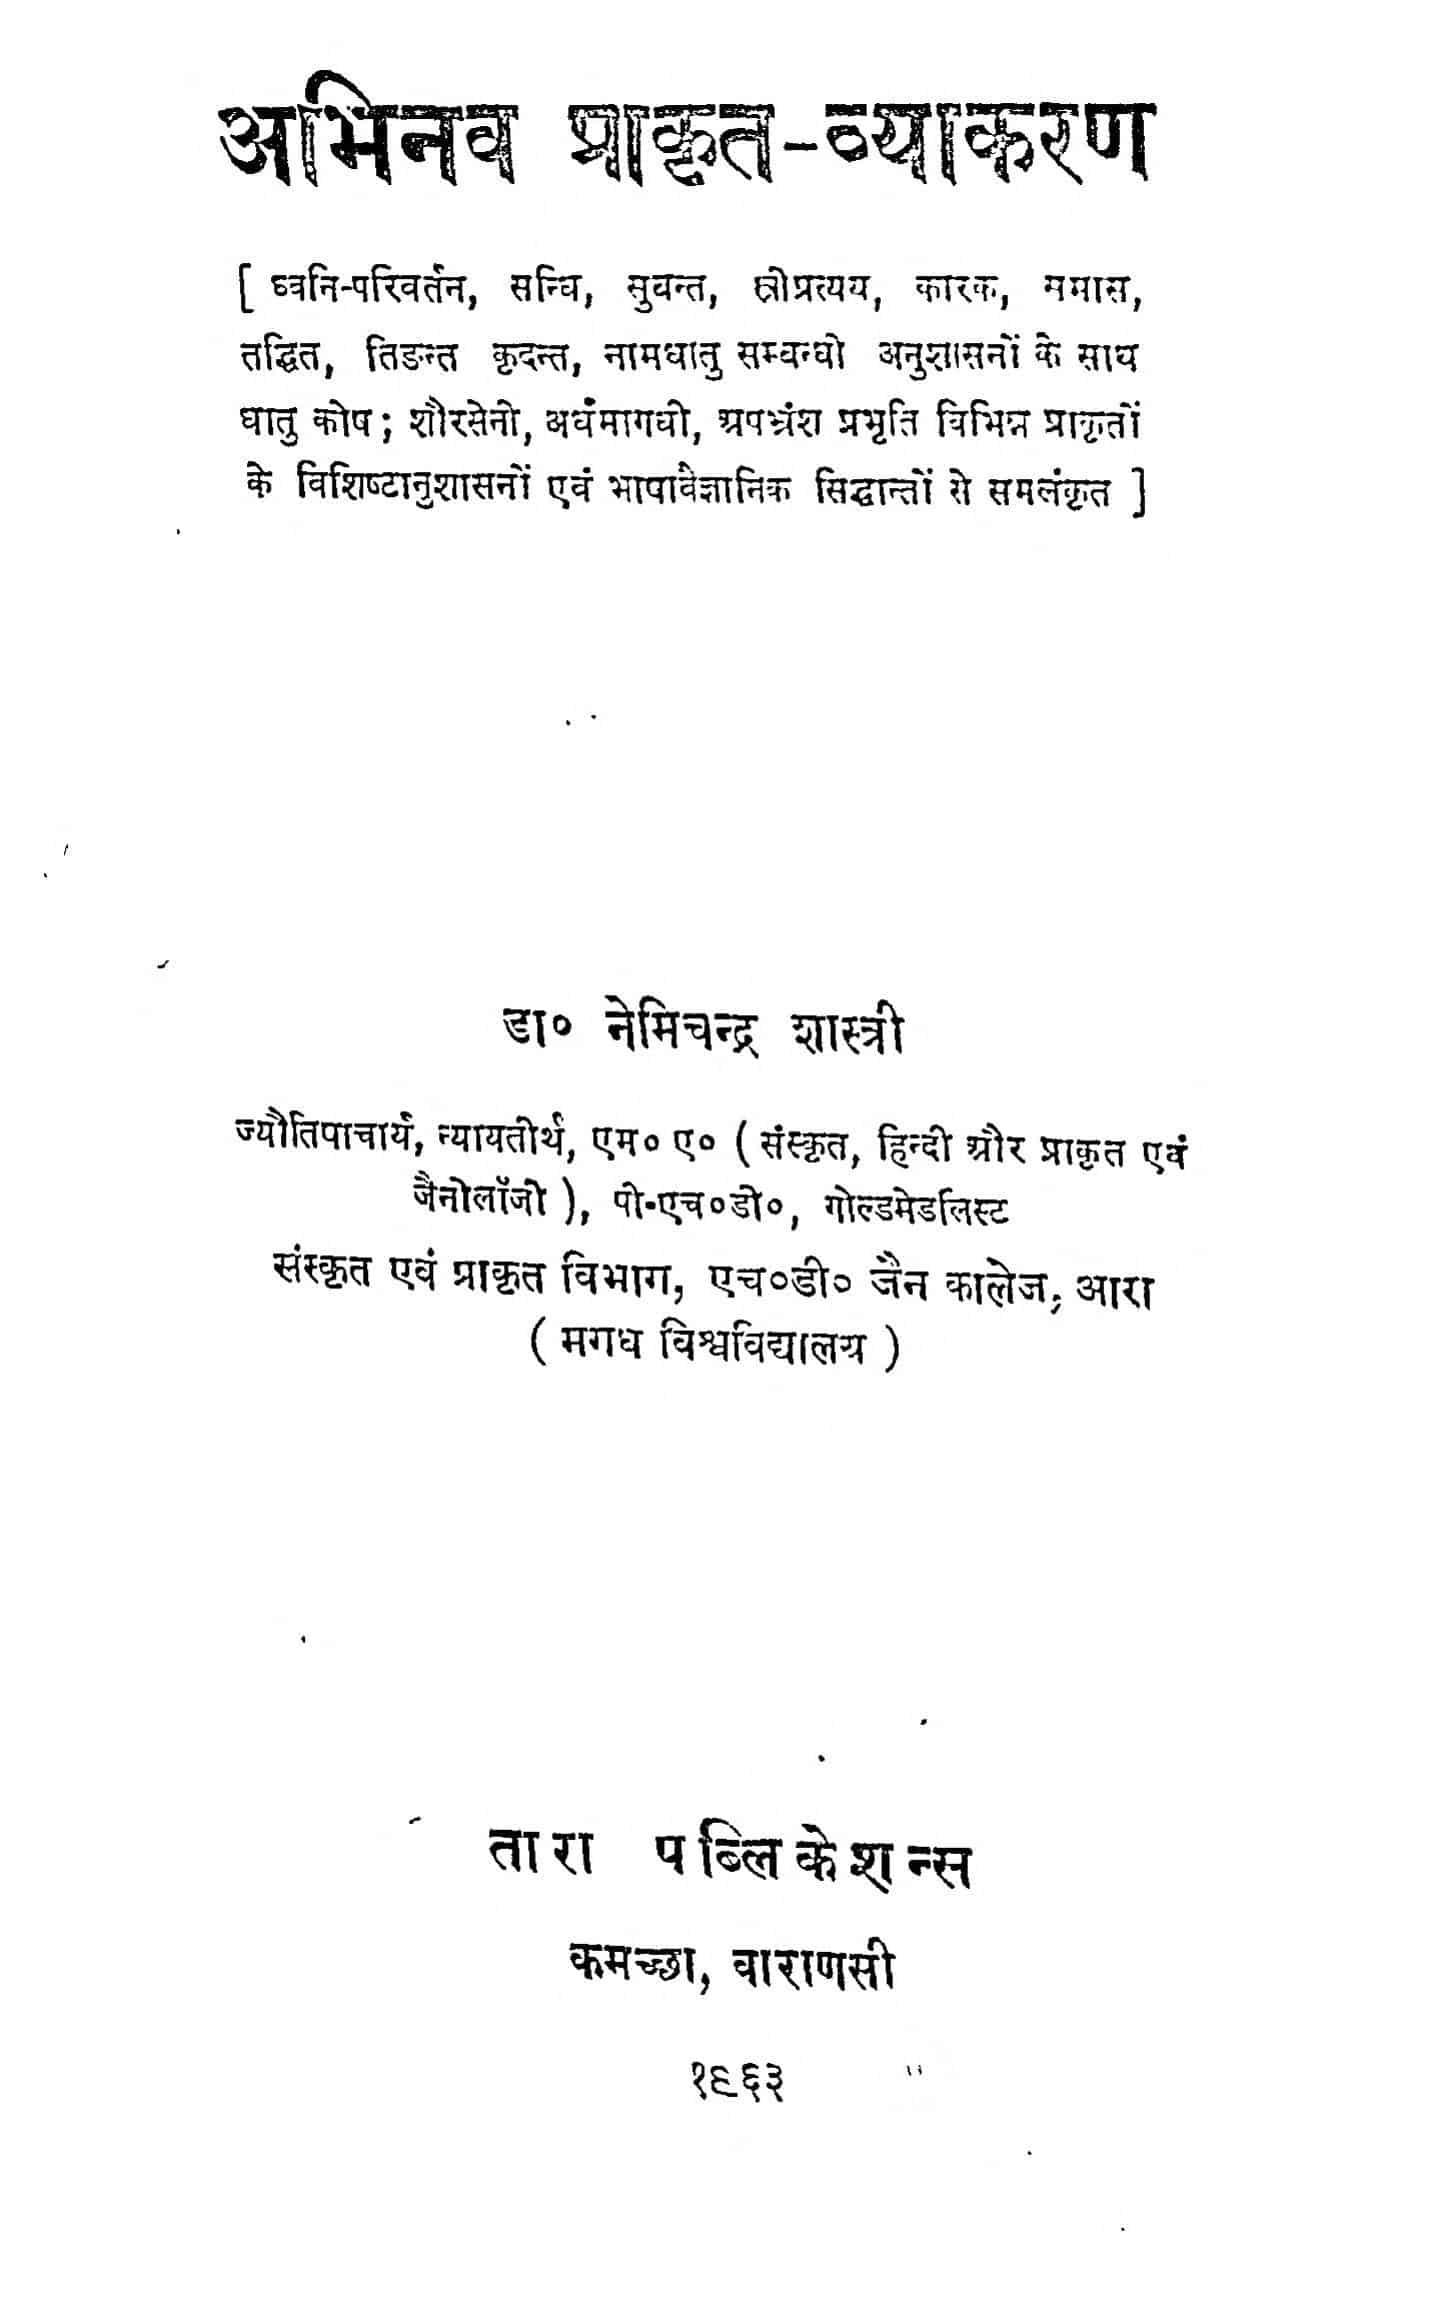 Book Image : अभिनव प्राकृत व्याकरण - Abhinav Prakrat Vyakaran